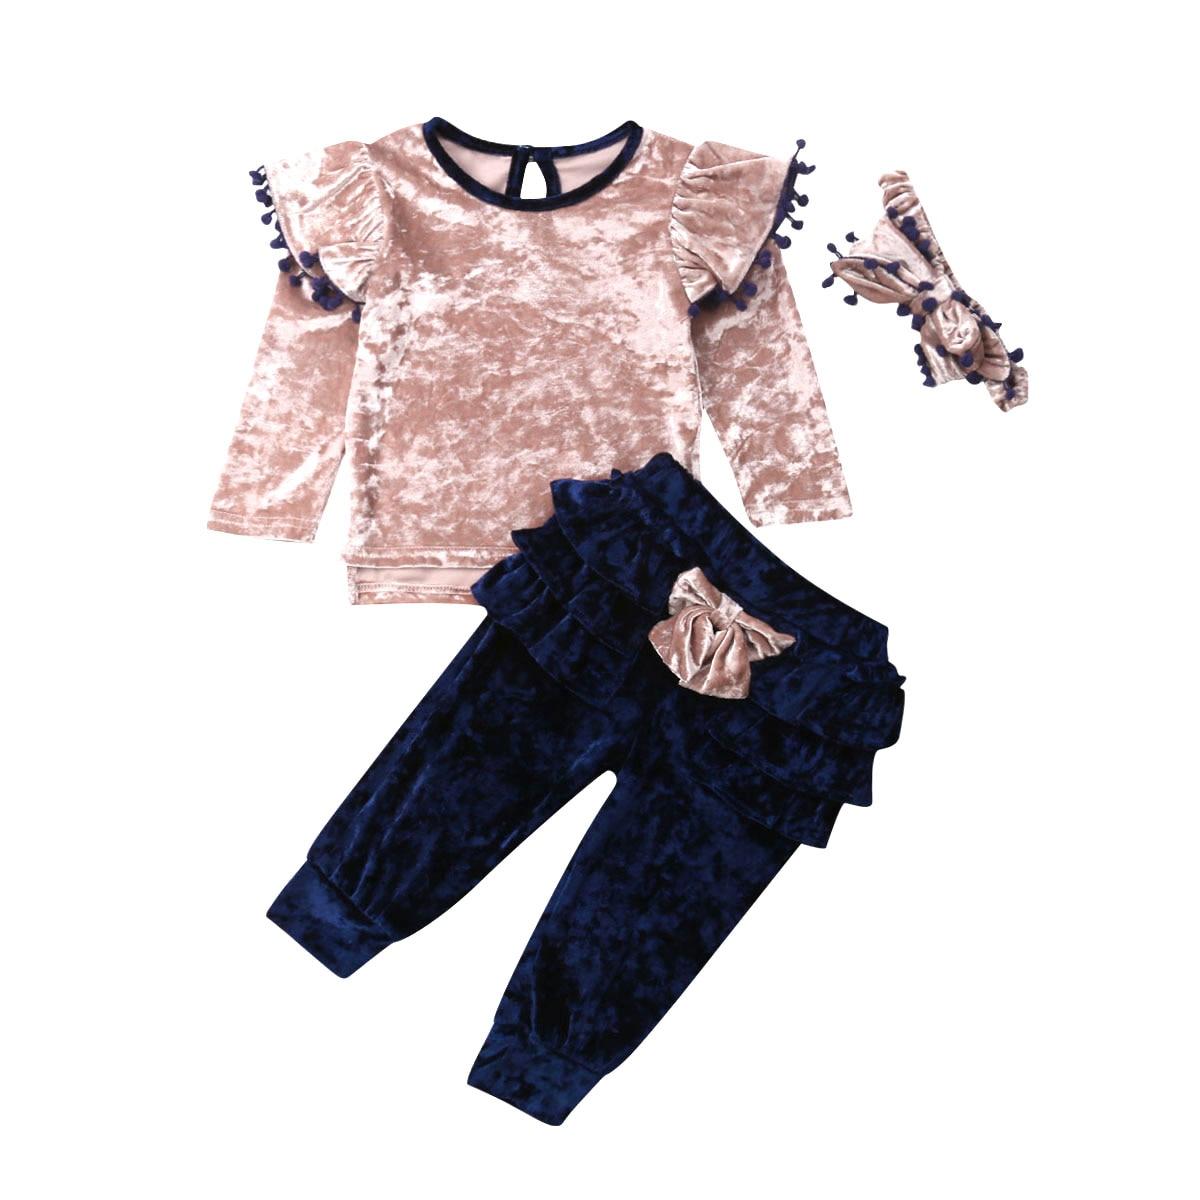 1-6Y Kleinkind Kinder Baby Mädchen Langarm Samt Shirt Tops Rüschen Bogen Lange Hose Hosen Stirnband 3PCS Kleidung Set